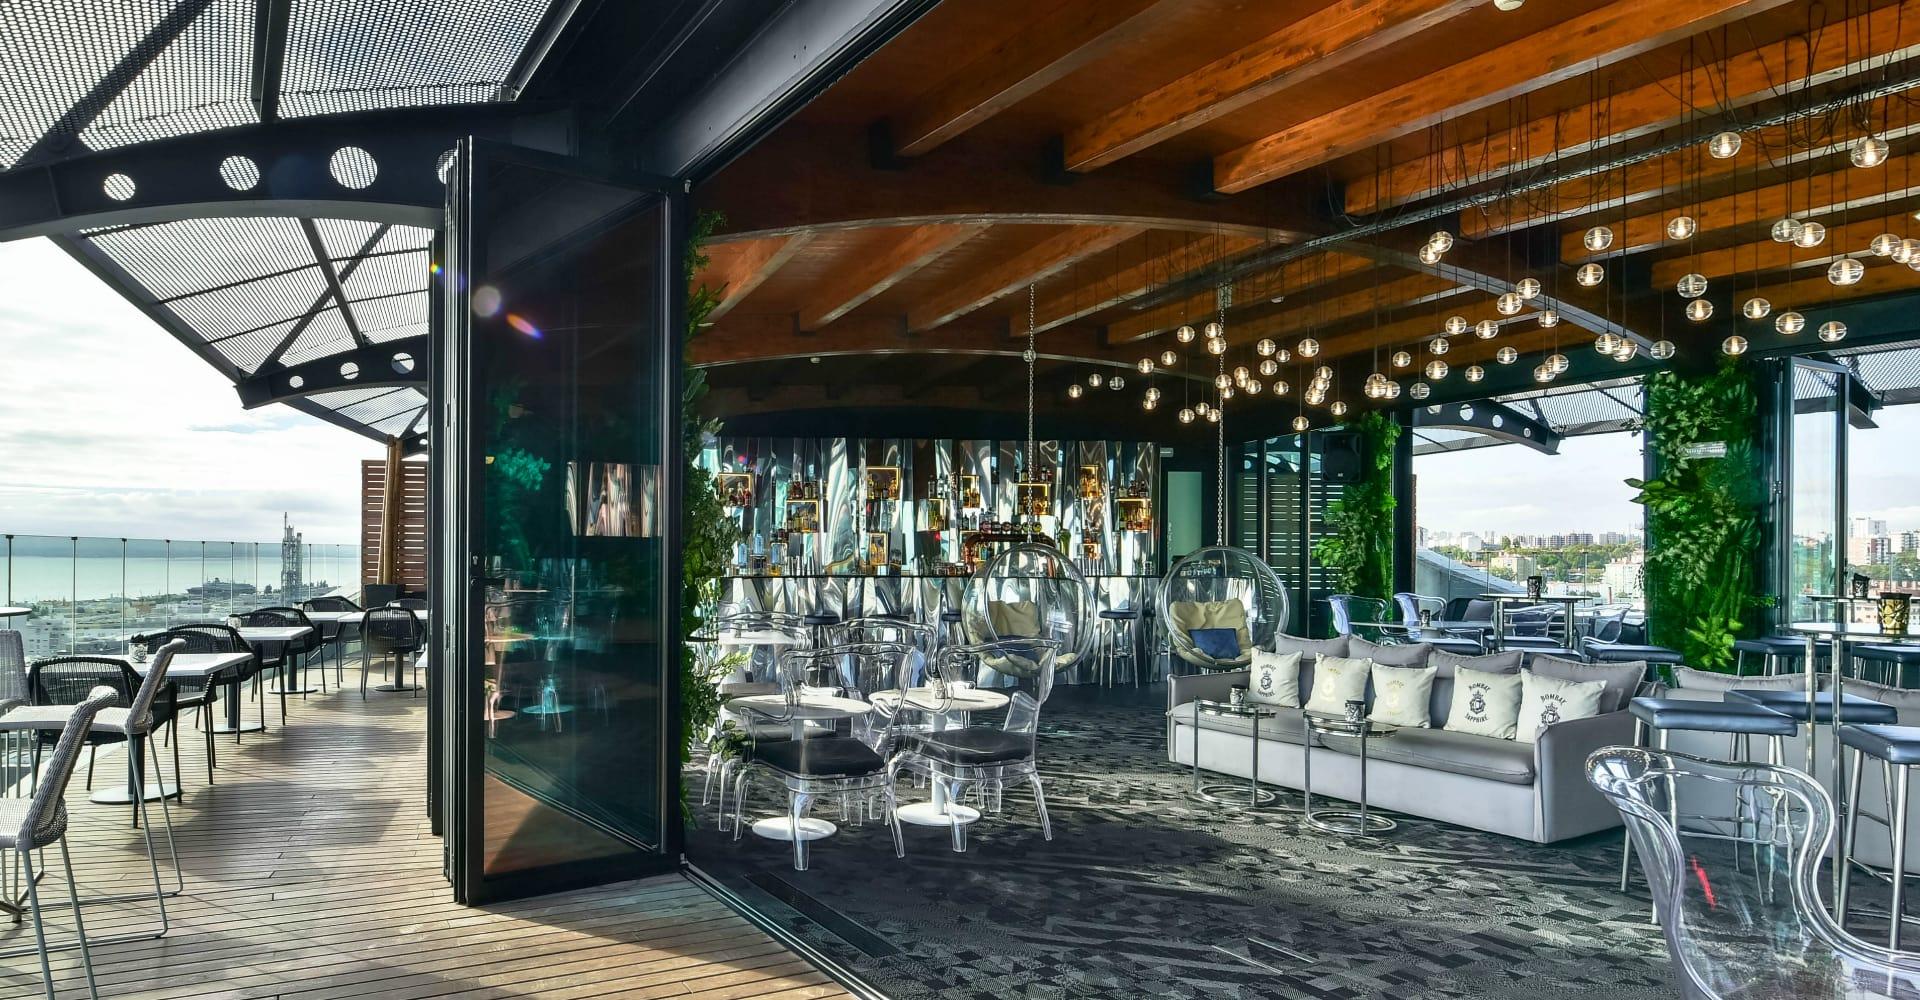 Tivoli Oriente 4 Sterne Hotel In Lissabon Portugal